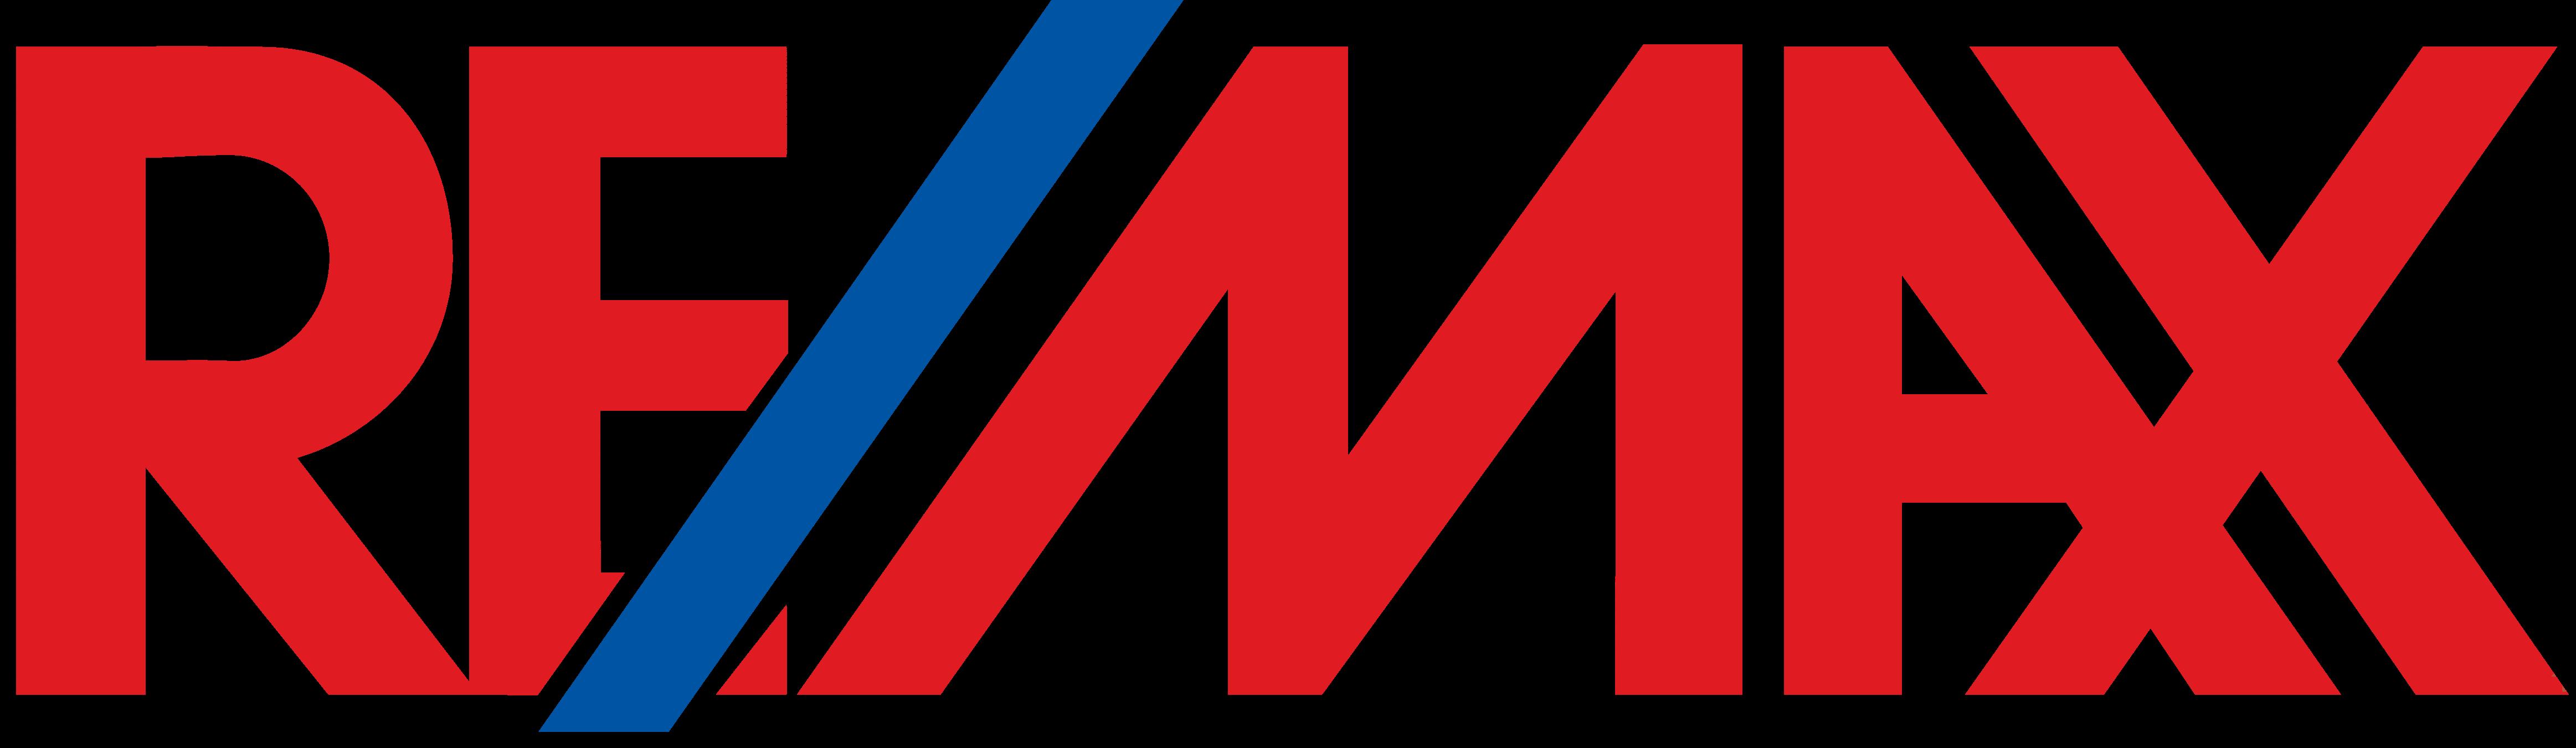 Remax_logo